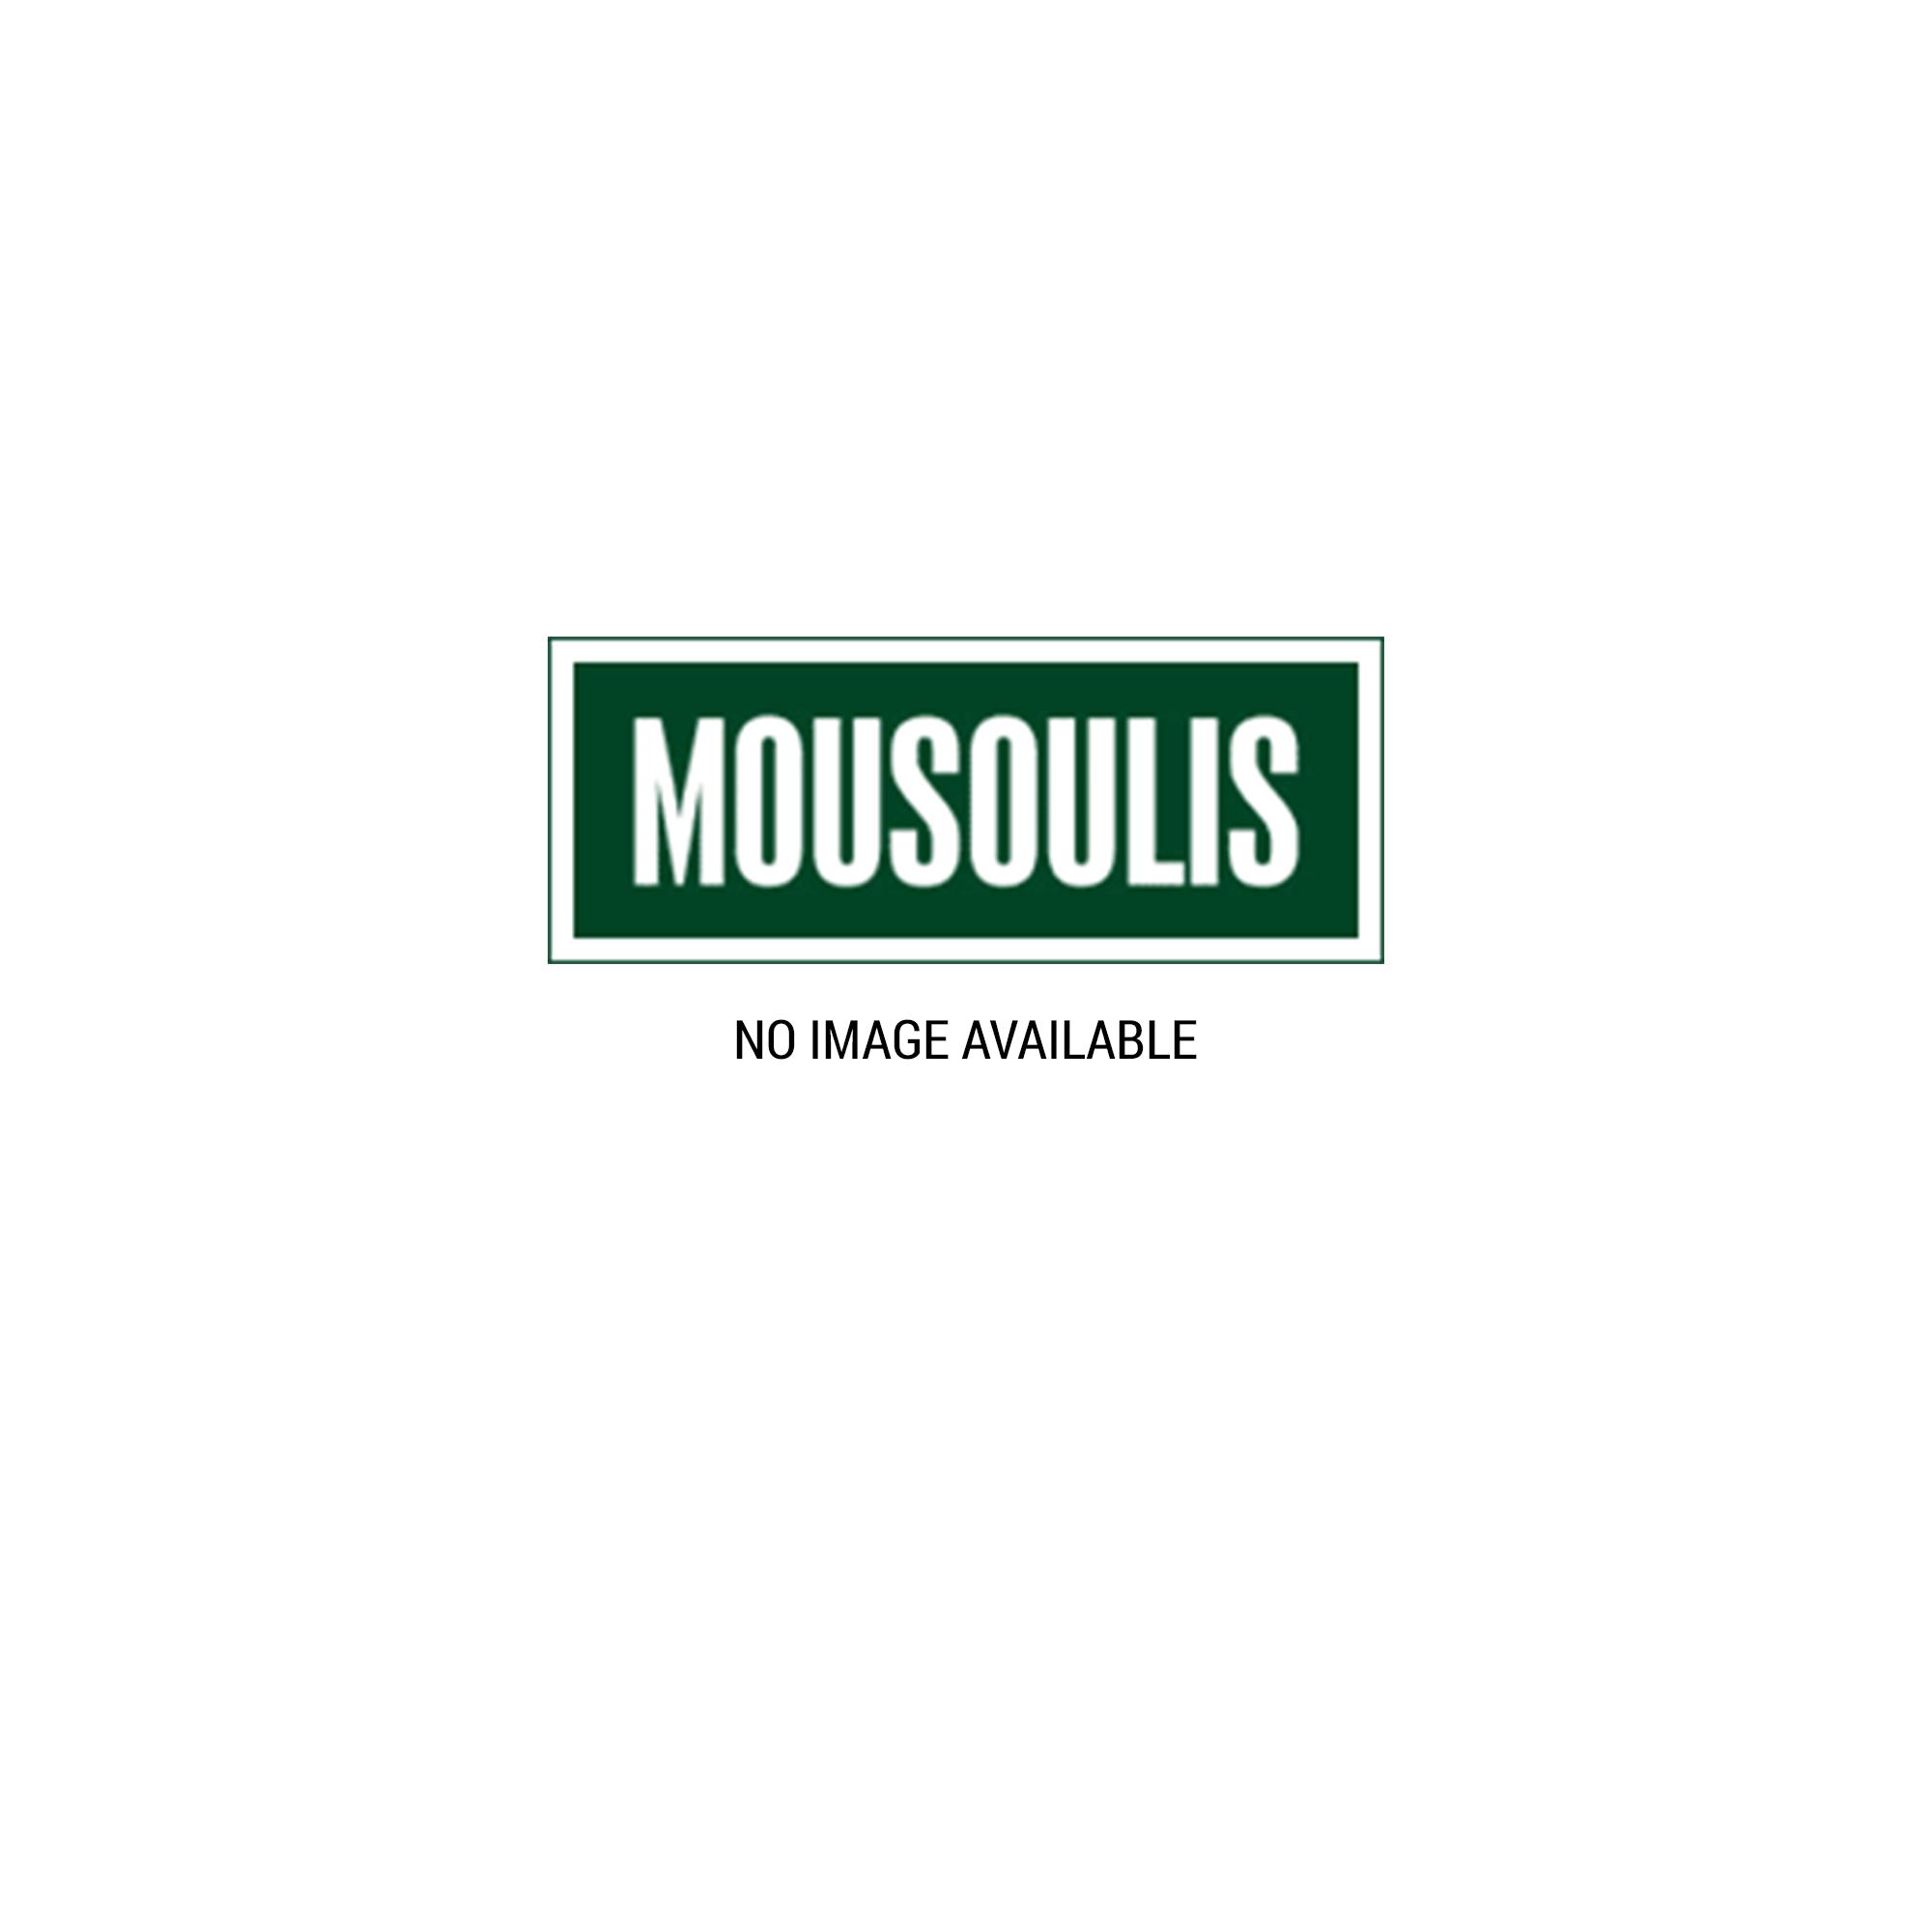 1ff92e3606 All brands - All products Τσάντες   Αποσκευέςστο MOUSOULIS